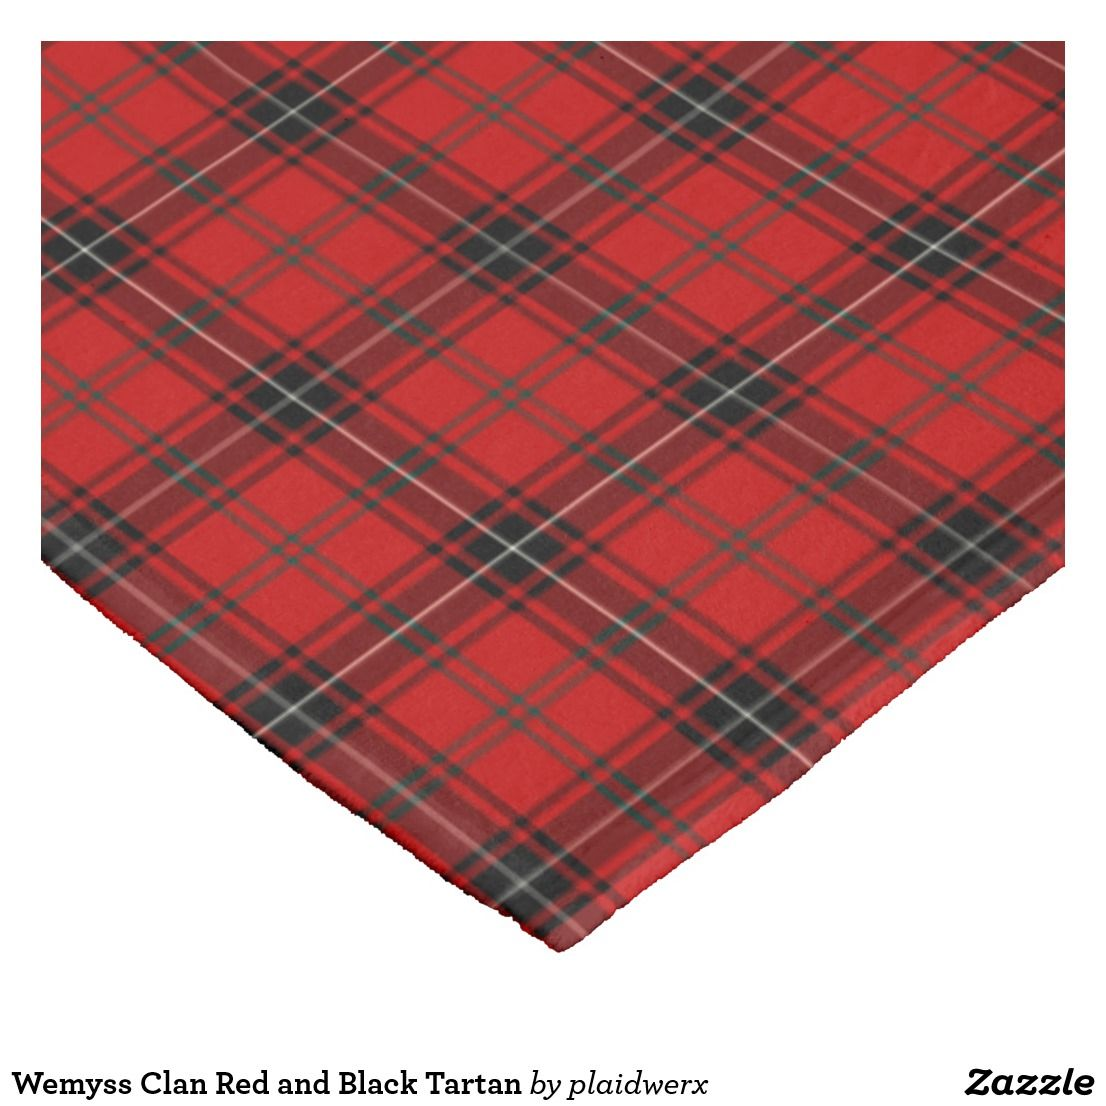 Wemyss Clan Red and Black Tartan Fleece Blanket | Scottish plaid